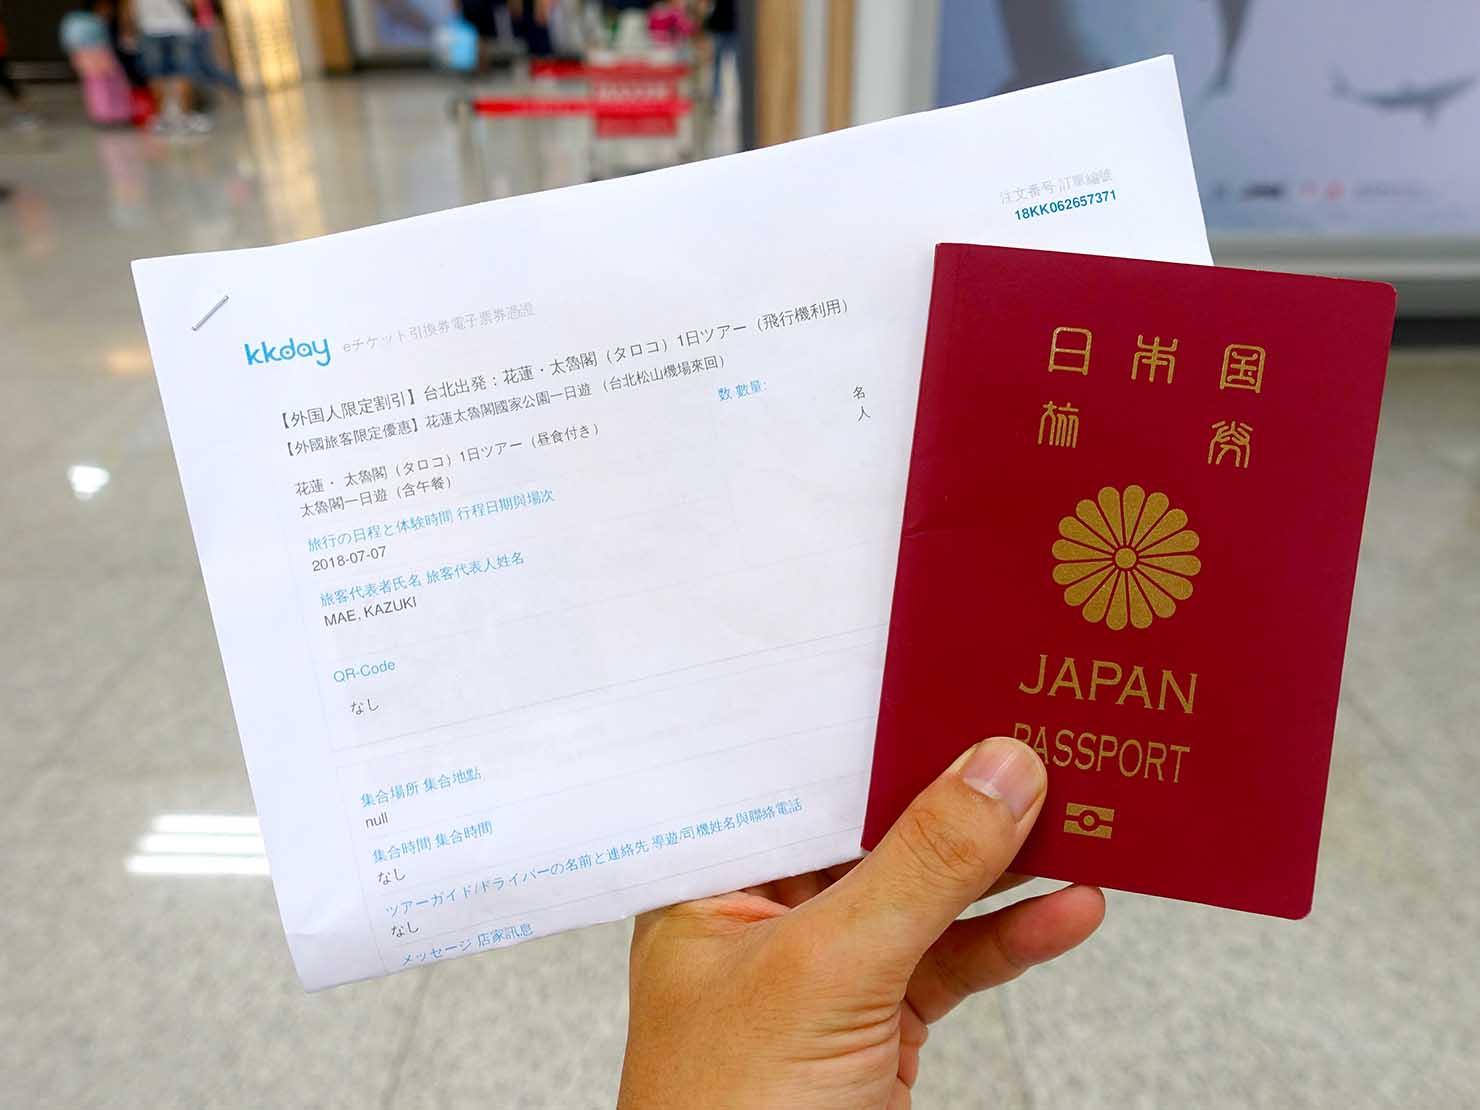 KKday外国人限定「花蓮・太魯閣(タロコ)日帰りツアー」で飛行機搭乗に必要なもの